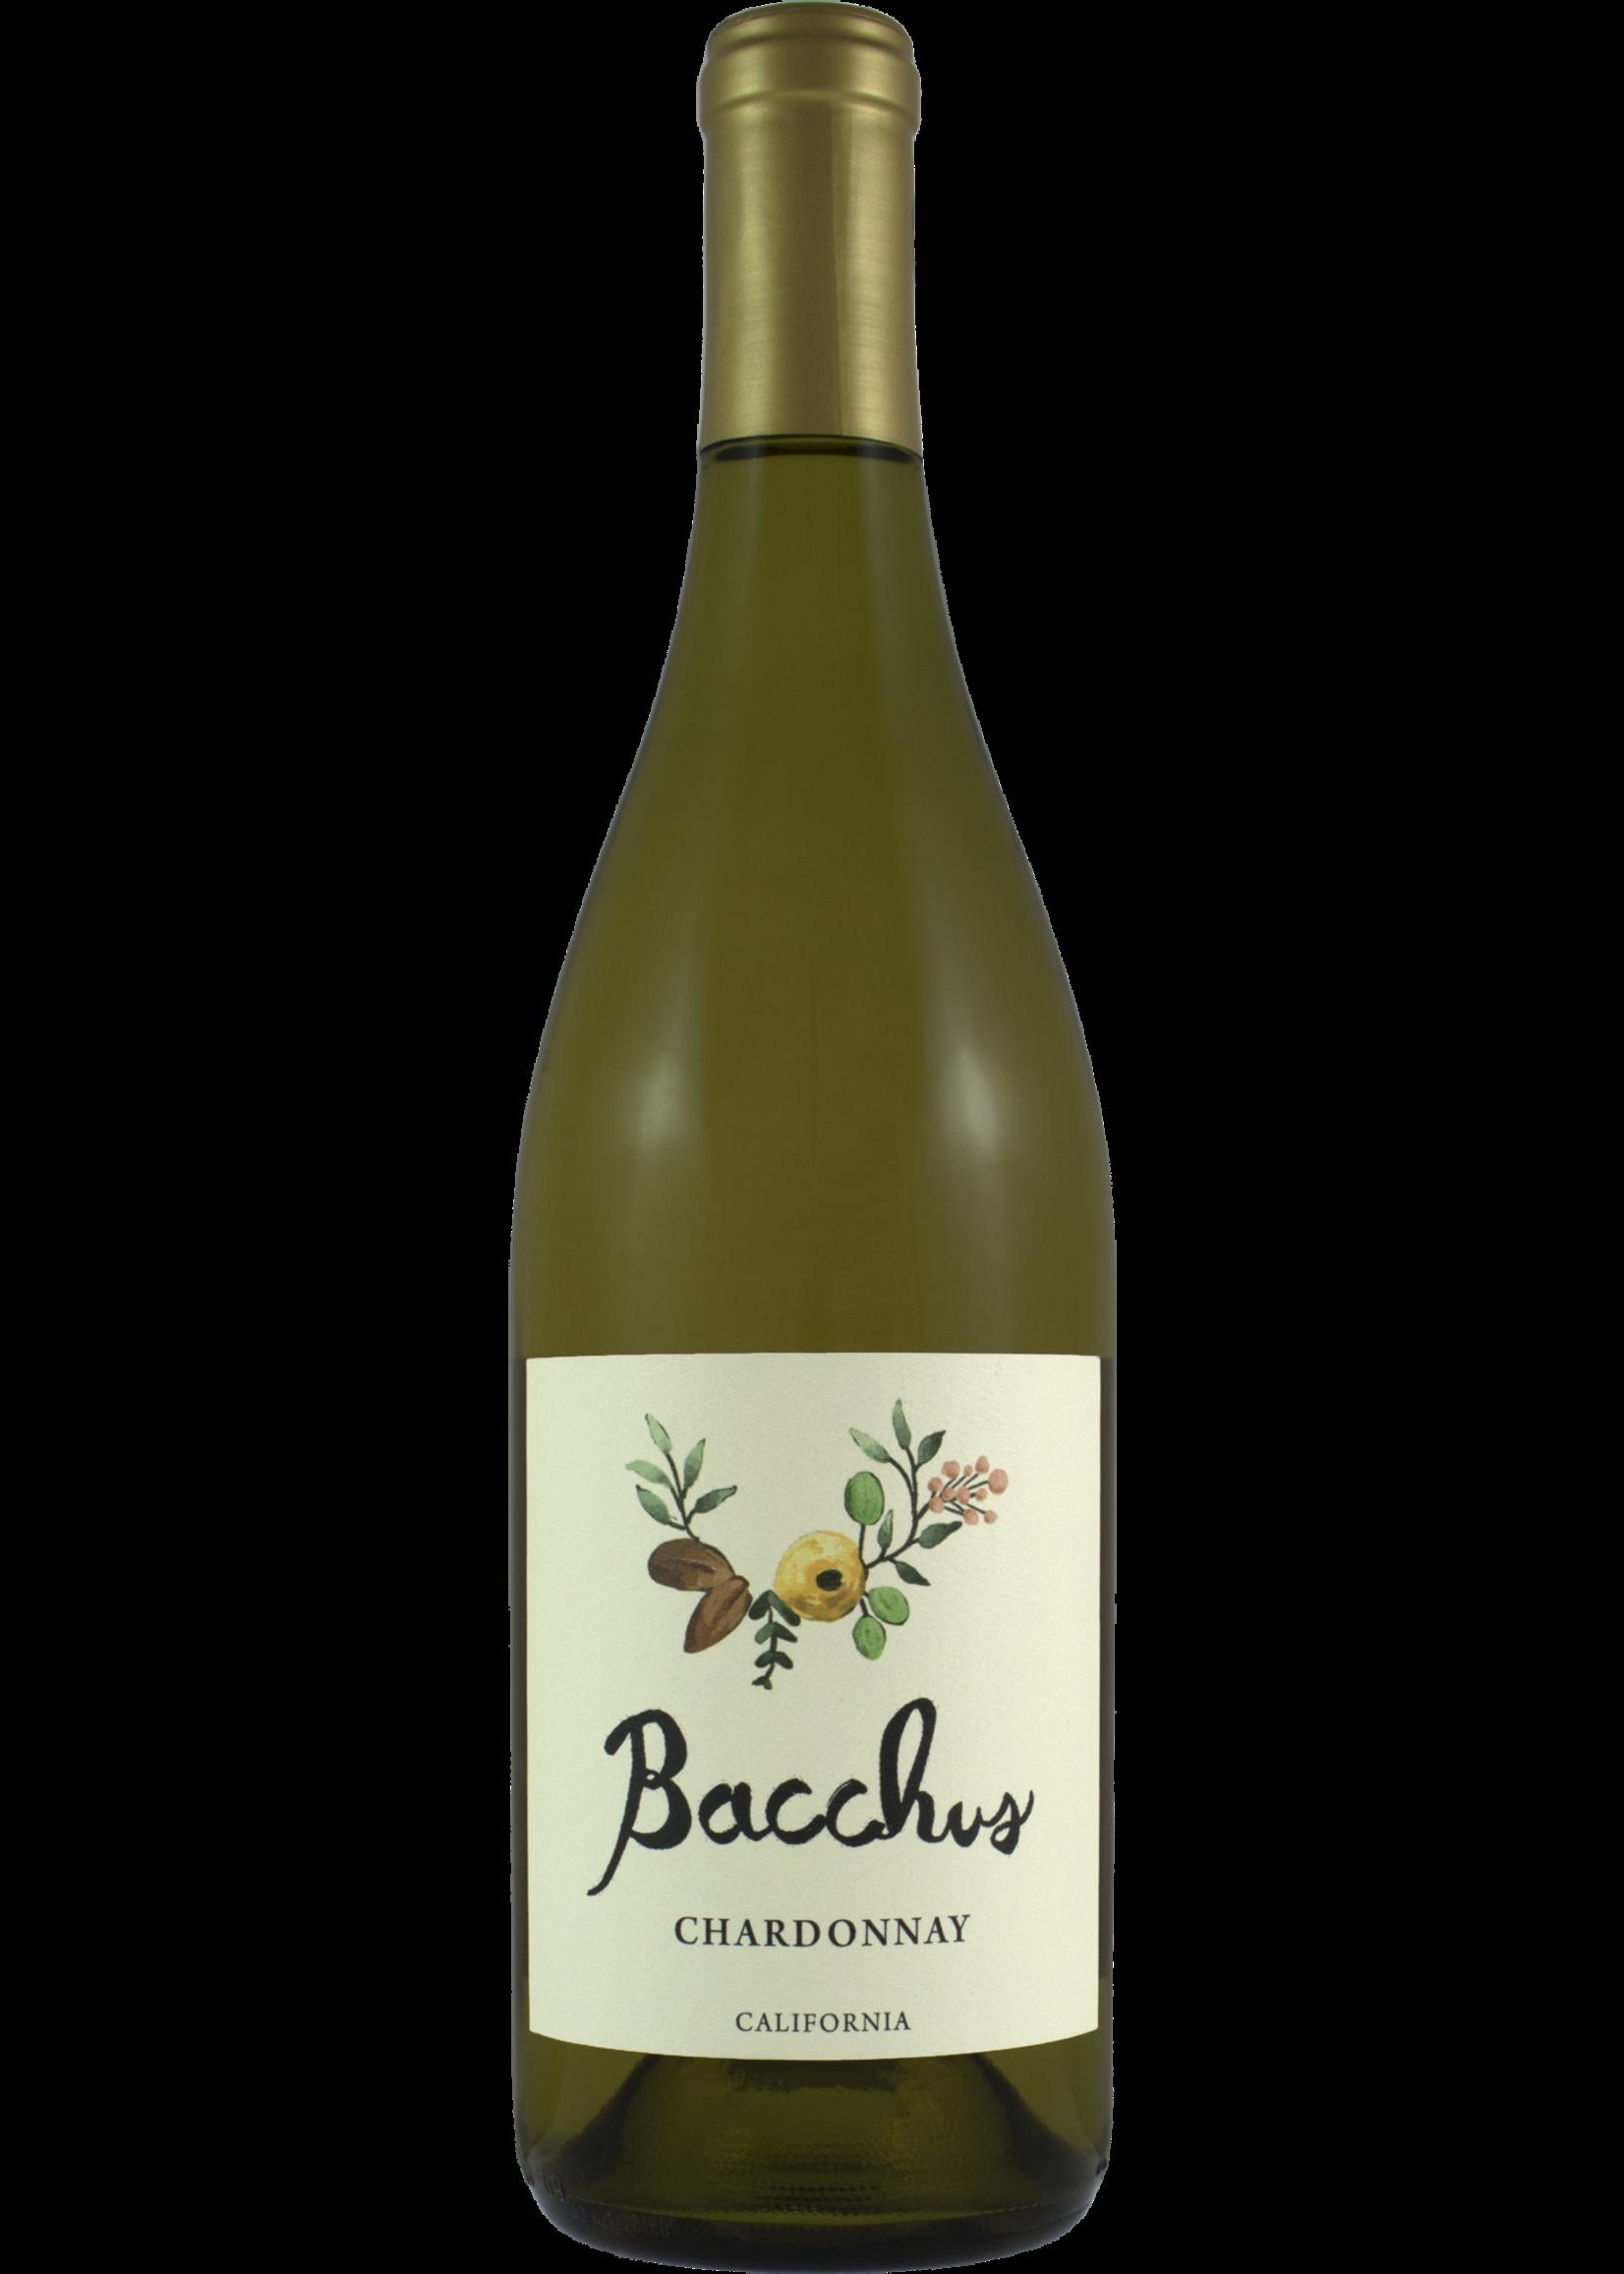 Bacchus Bacchus / Chardonnay California 2020 / 750mL